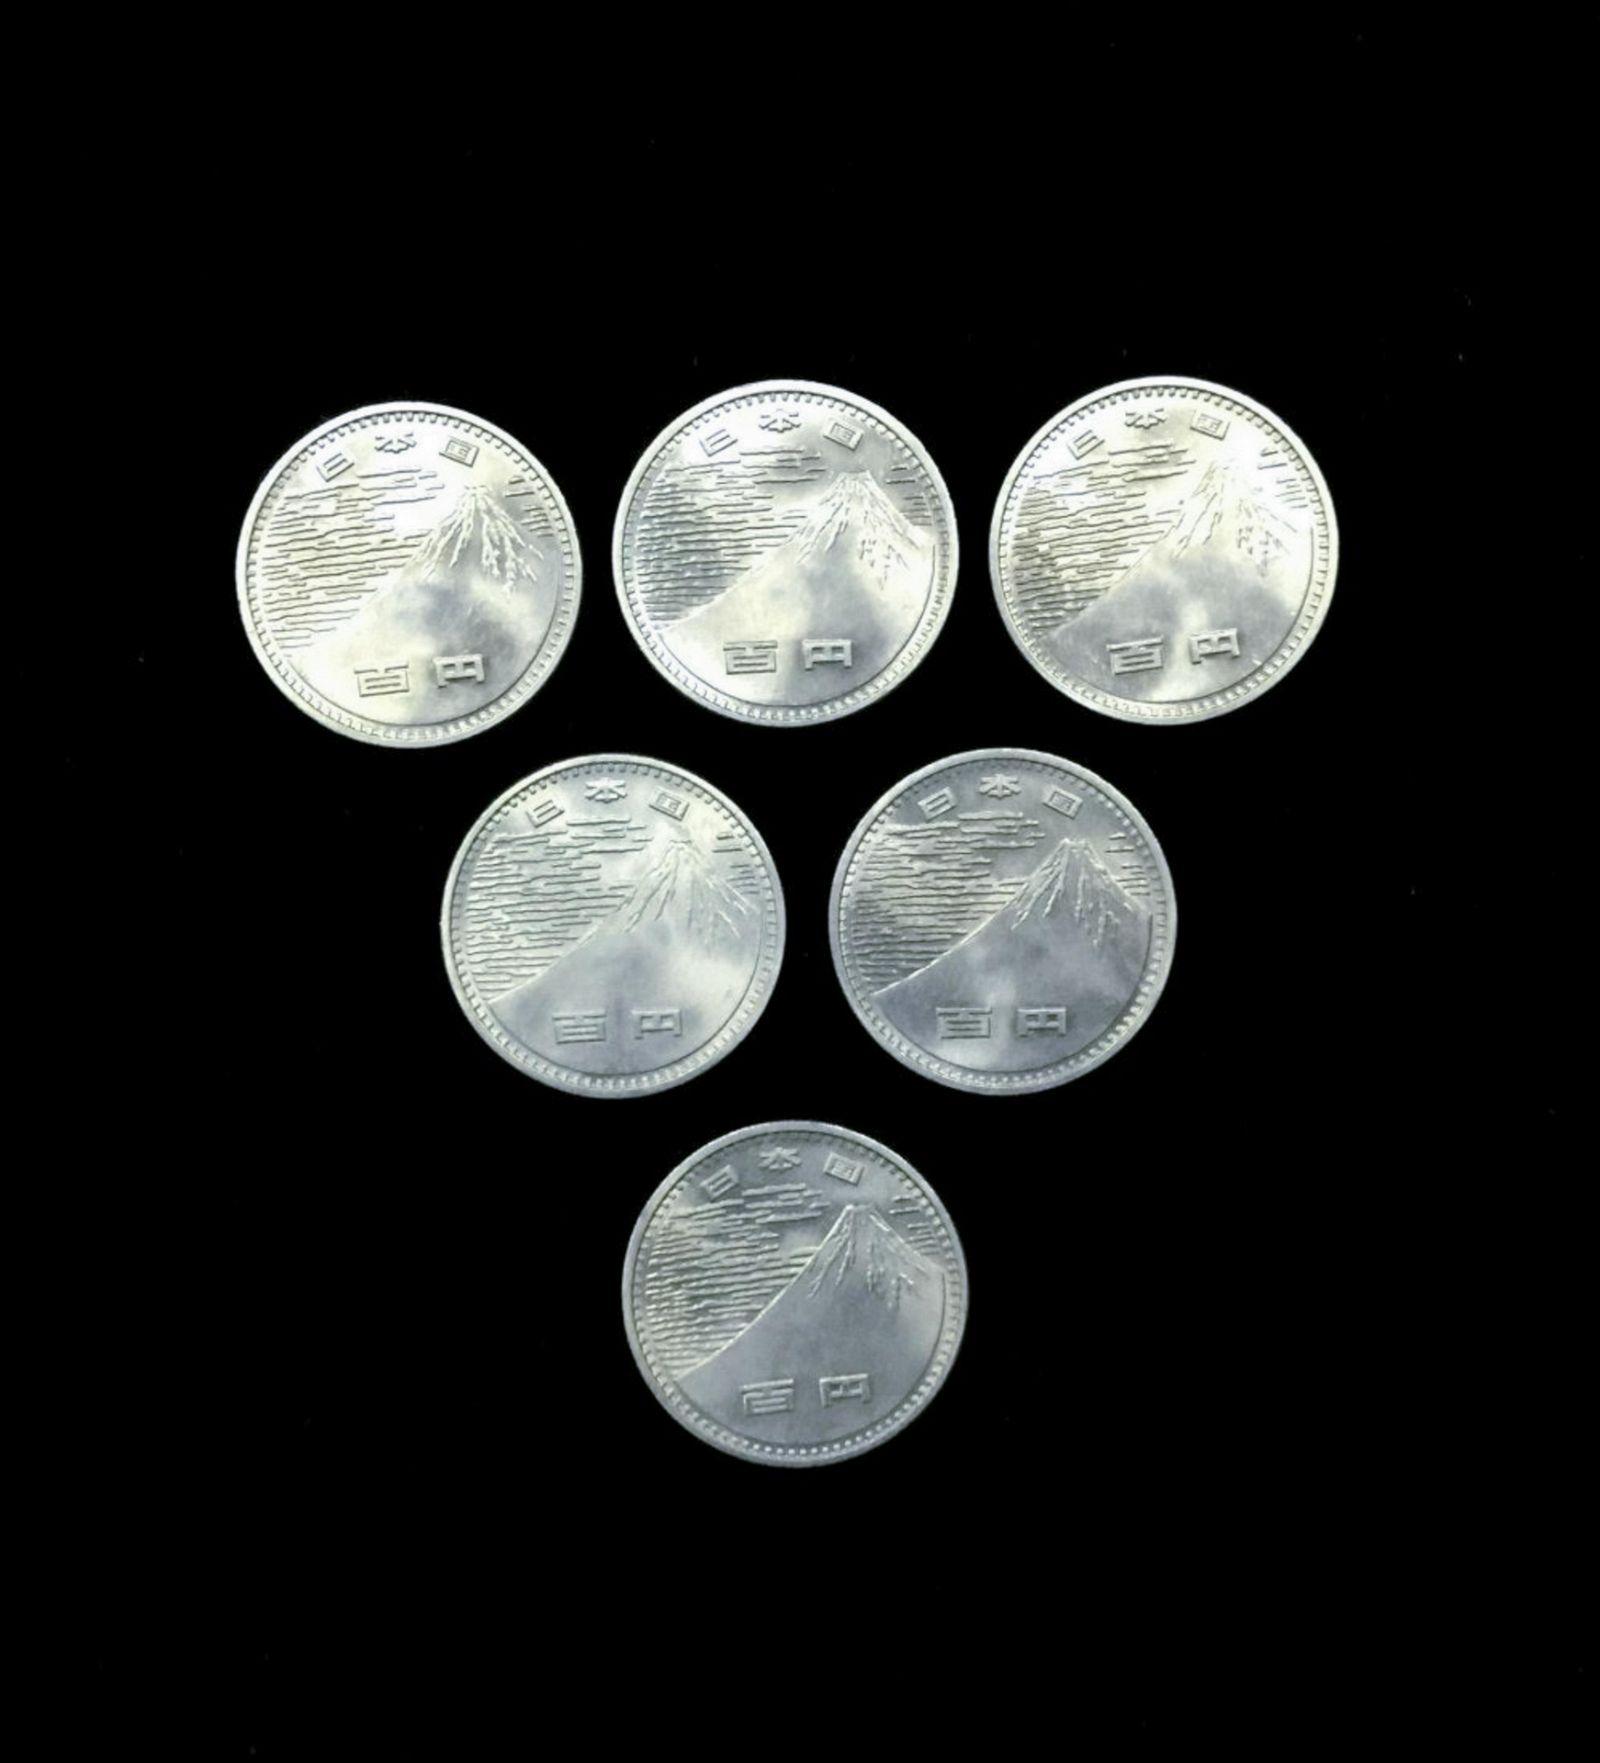 100 YEN, ZHAO HE 45 JAPANESE COINS